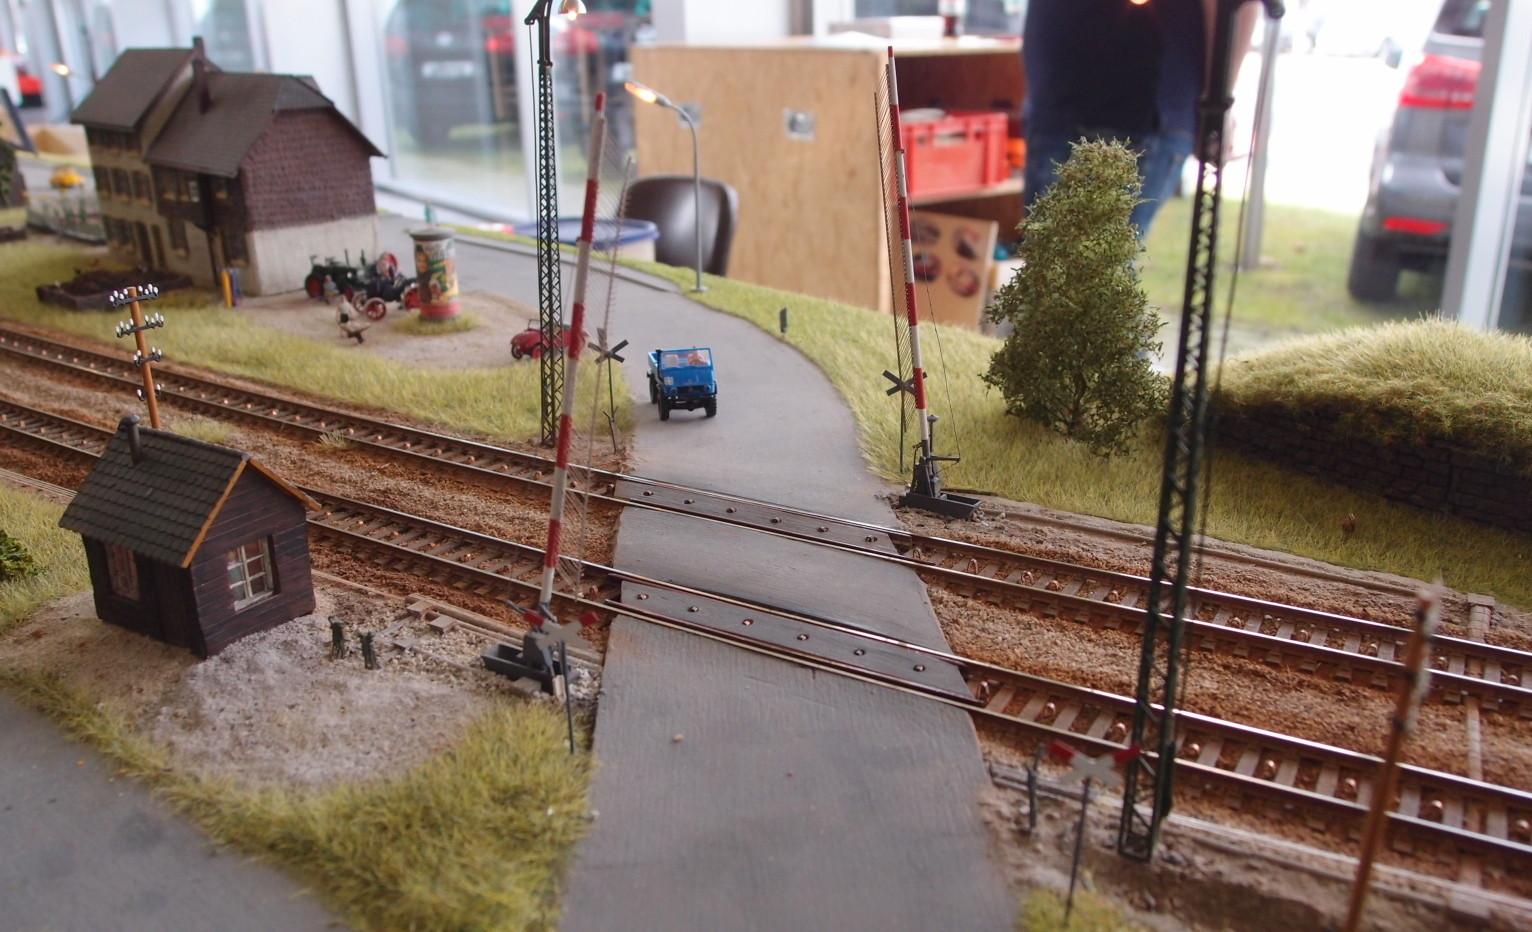 Modell-Eisenbahn-Freunde Kinzigtal